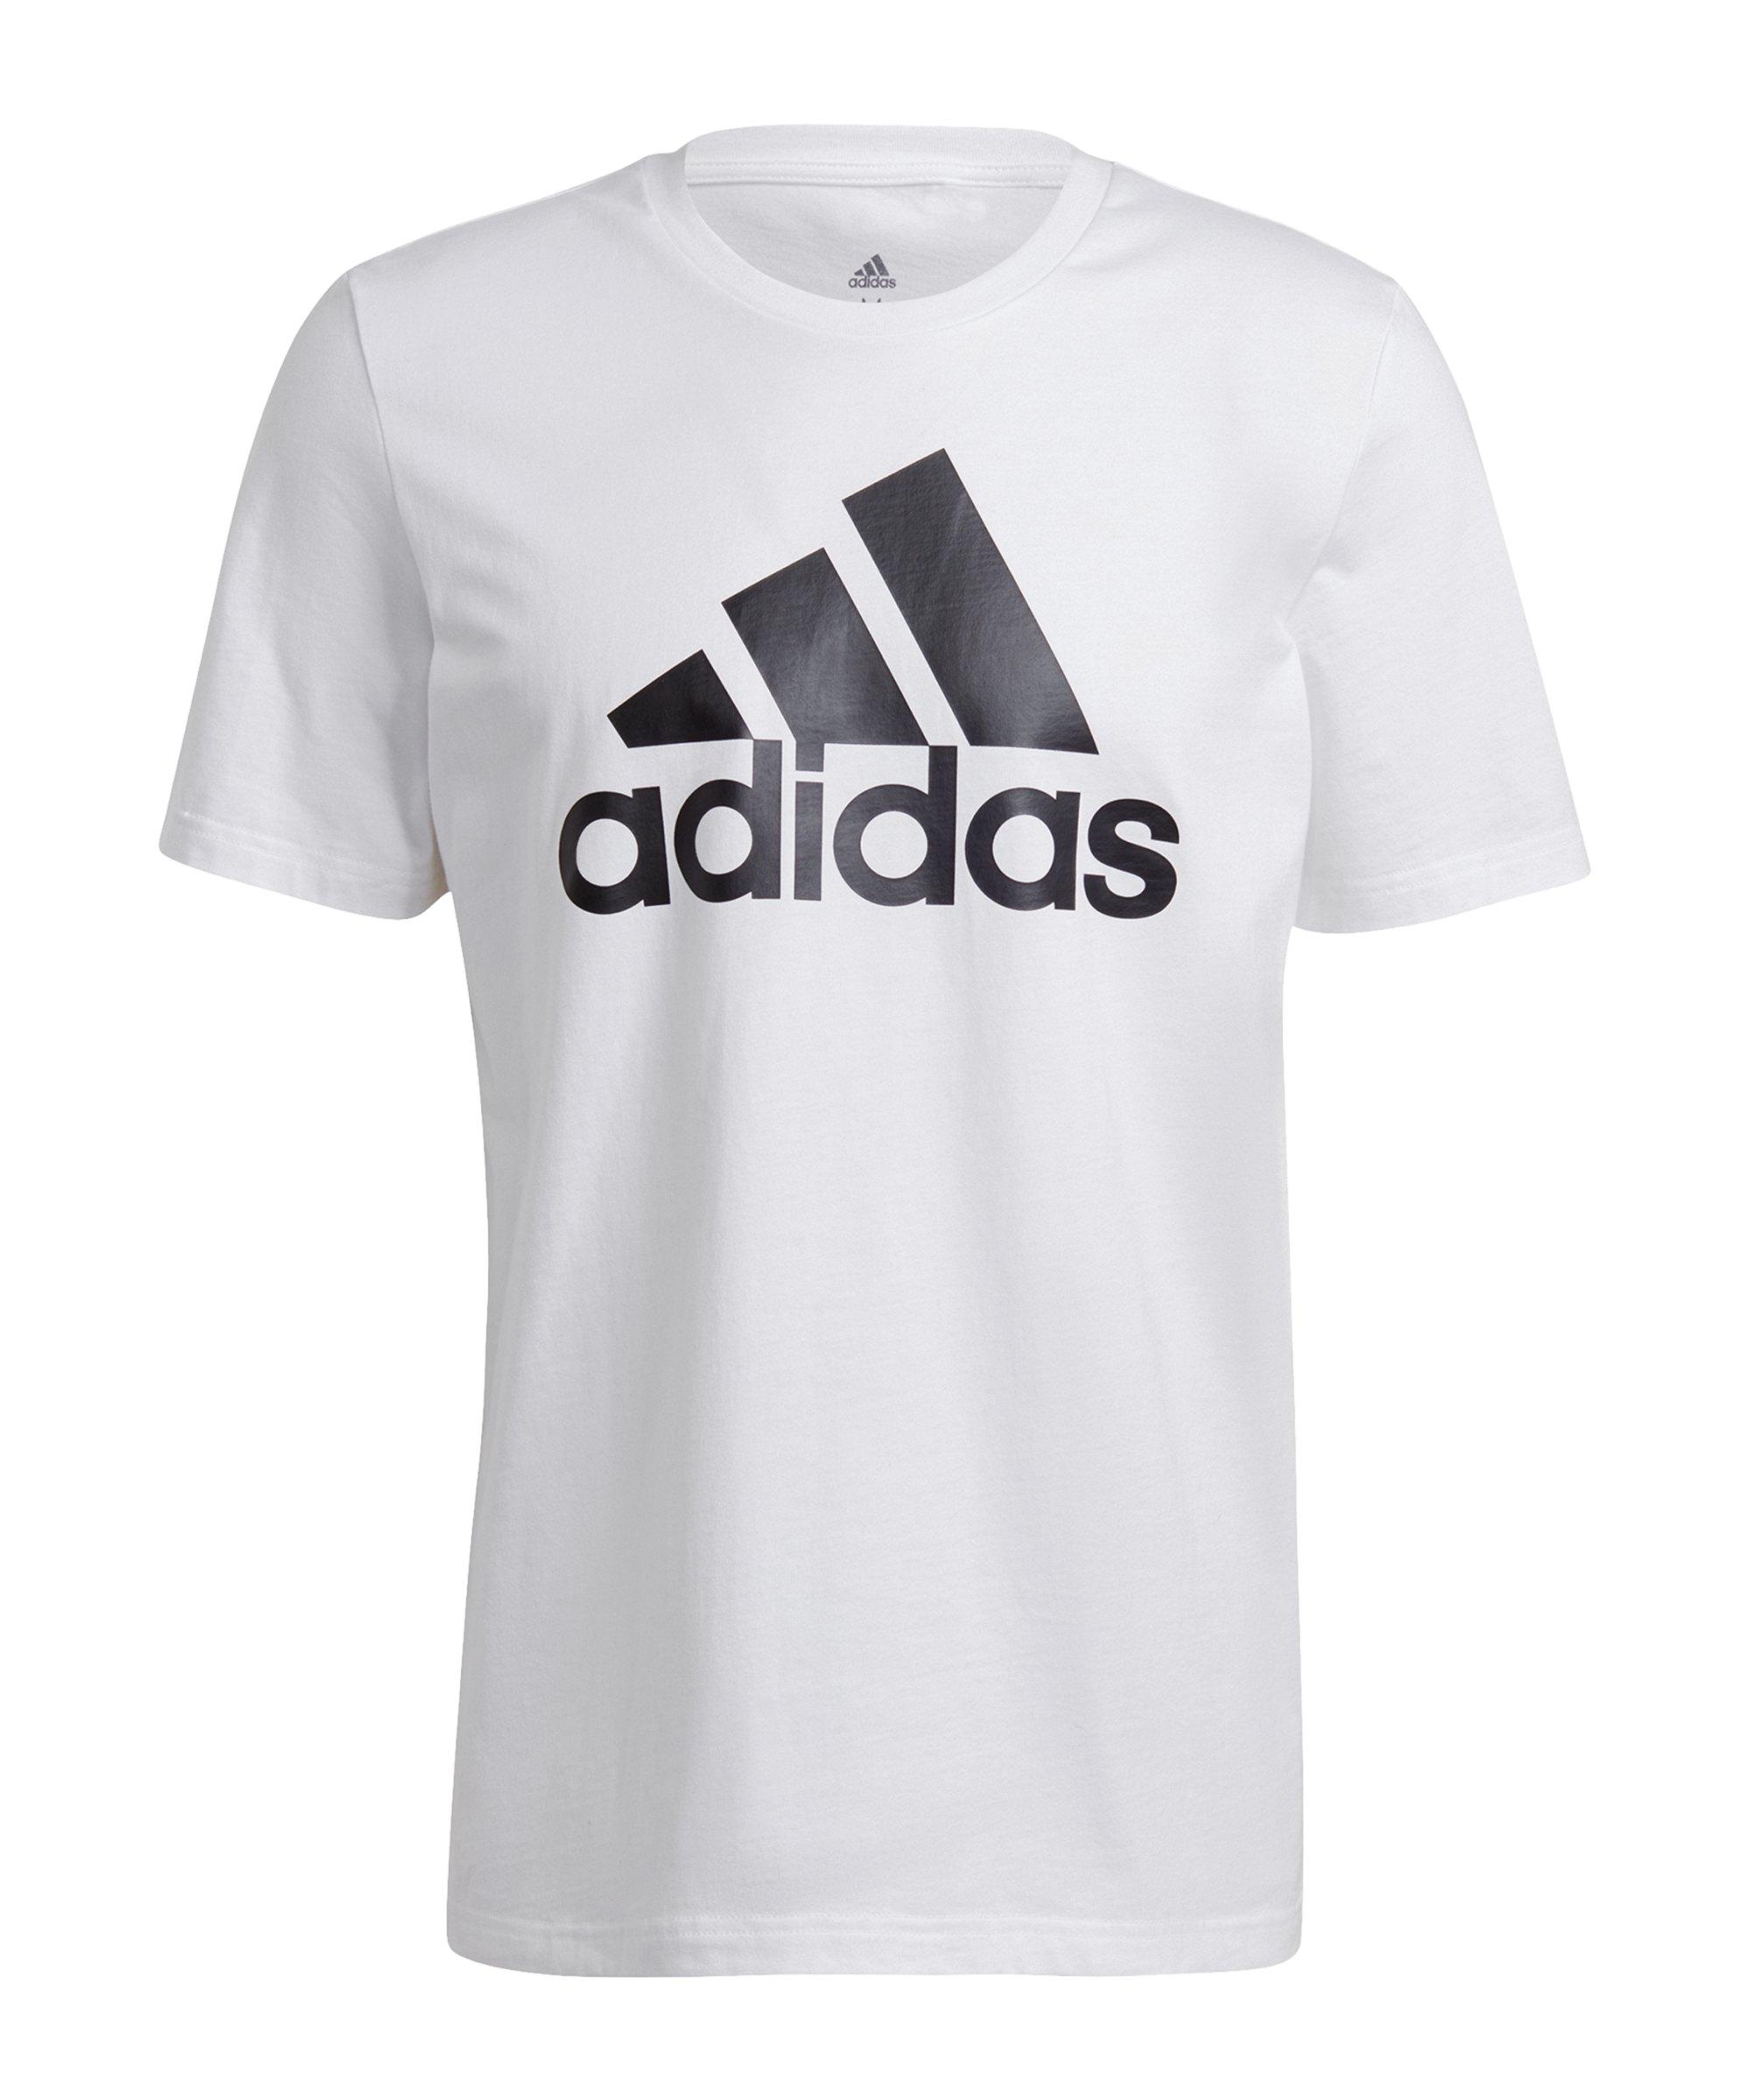 adidas Essentials T-Shirt Weiss Schwarz - weiss